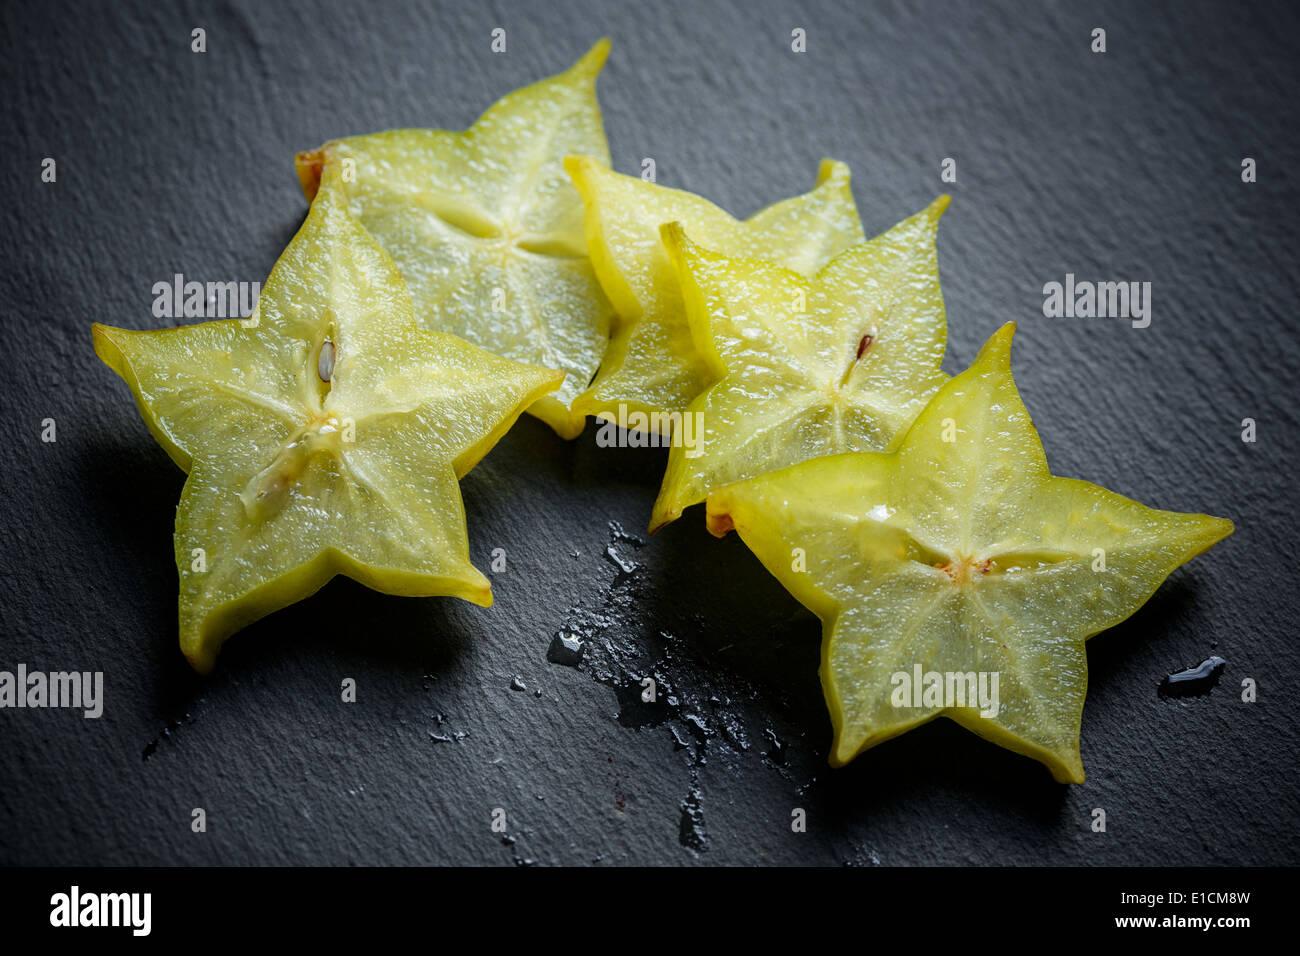 Star fruit - carambolas Imagen De Stock